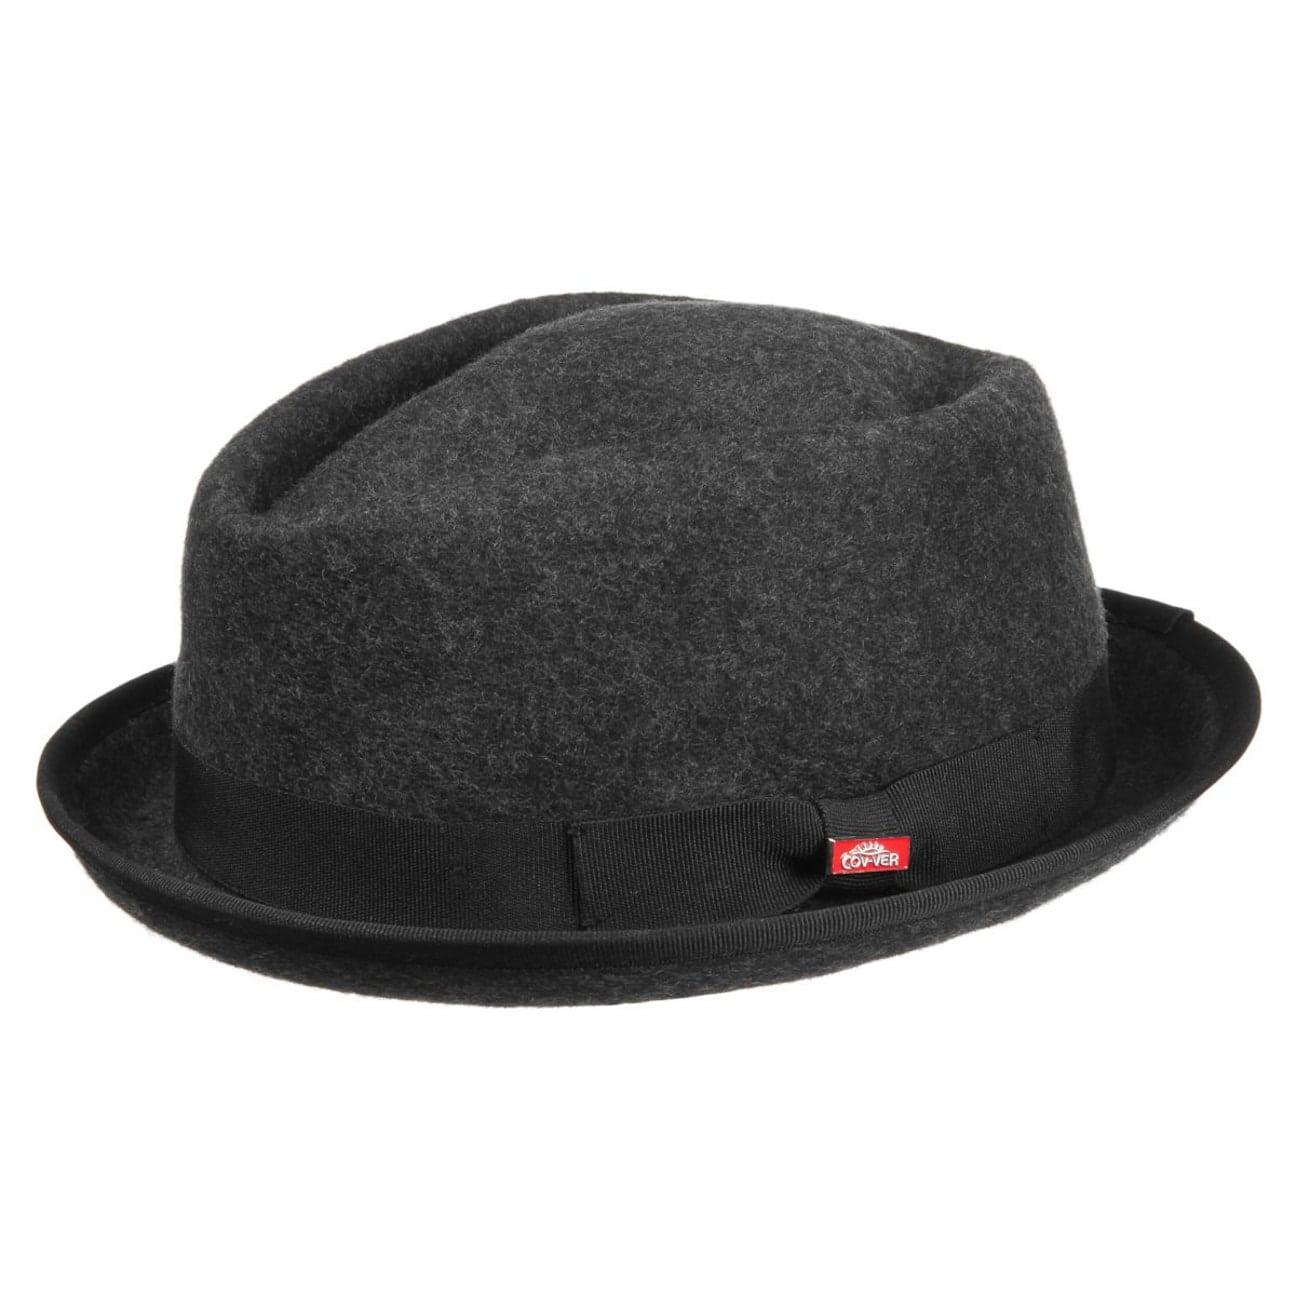 2cc28d9d69c8f ... Fedora Pork Pie Hat by Lierys - anthracite 1 ...